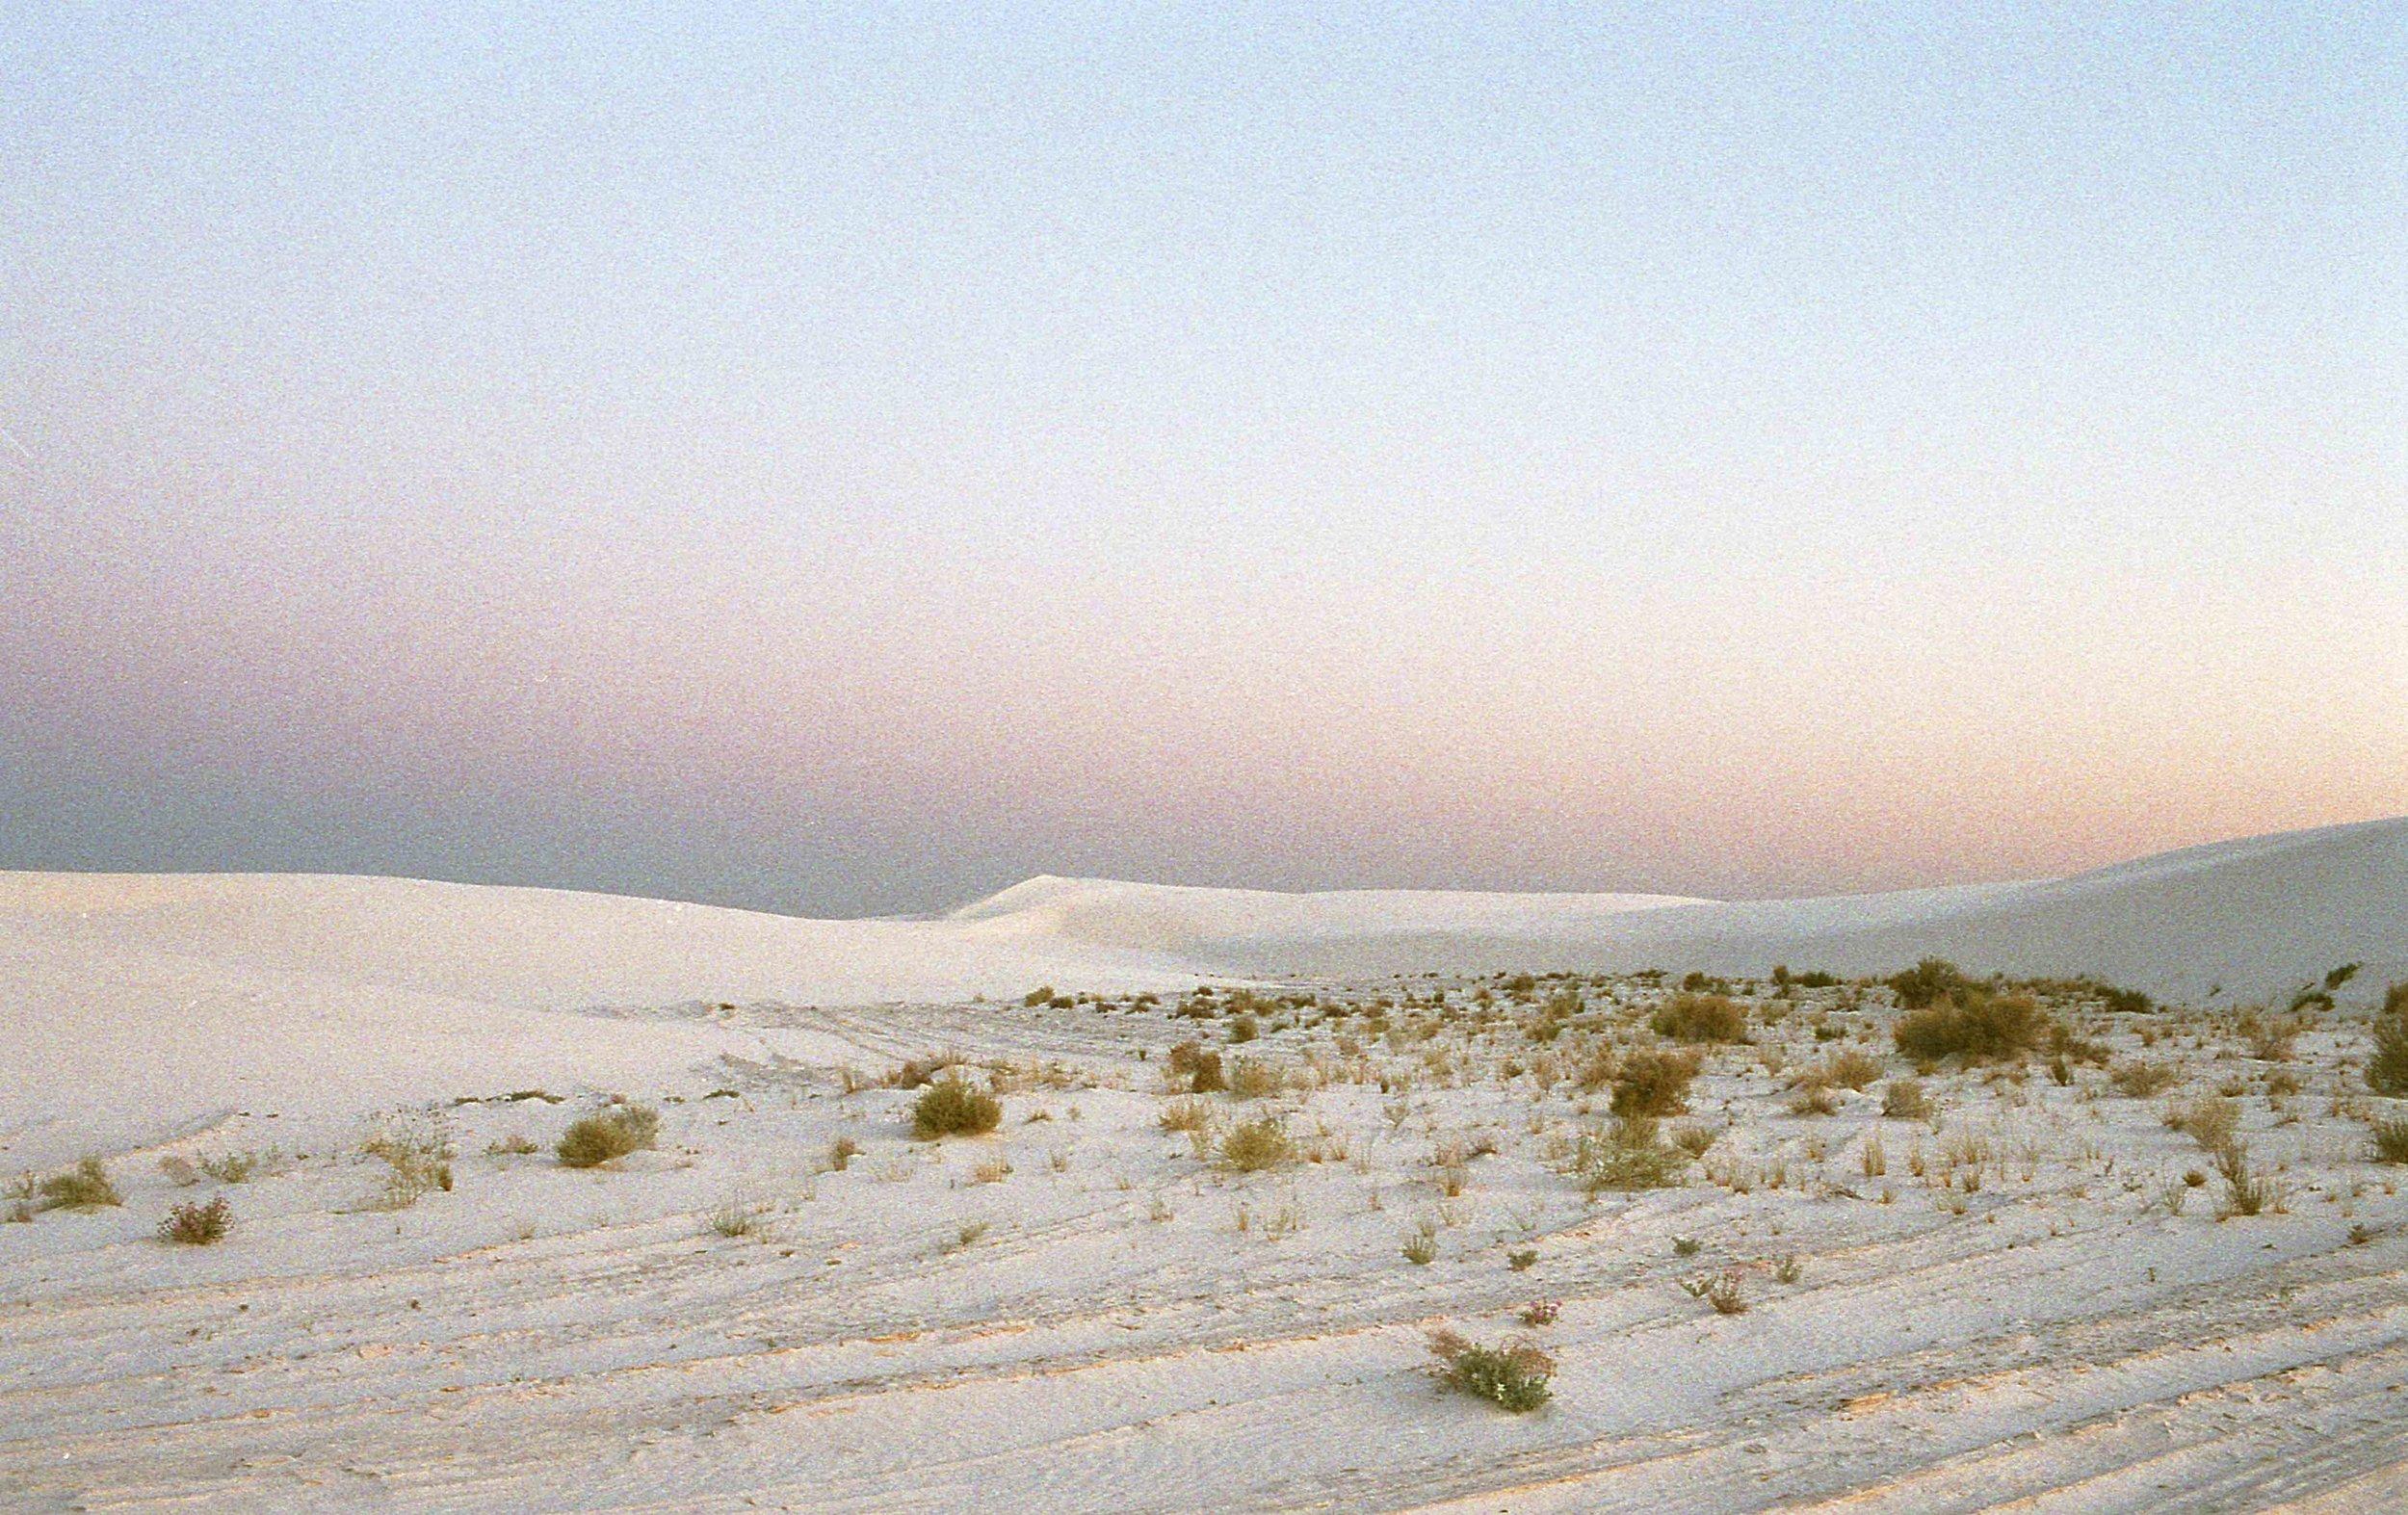 Desert018.jpeg